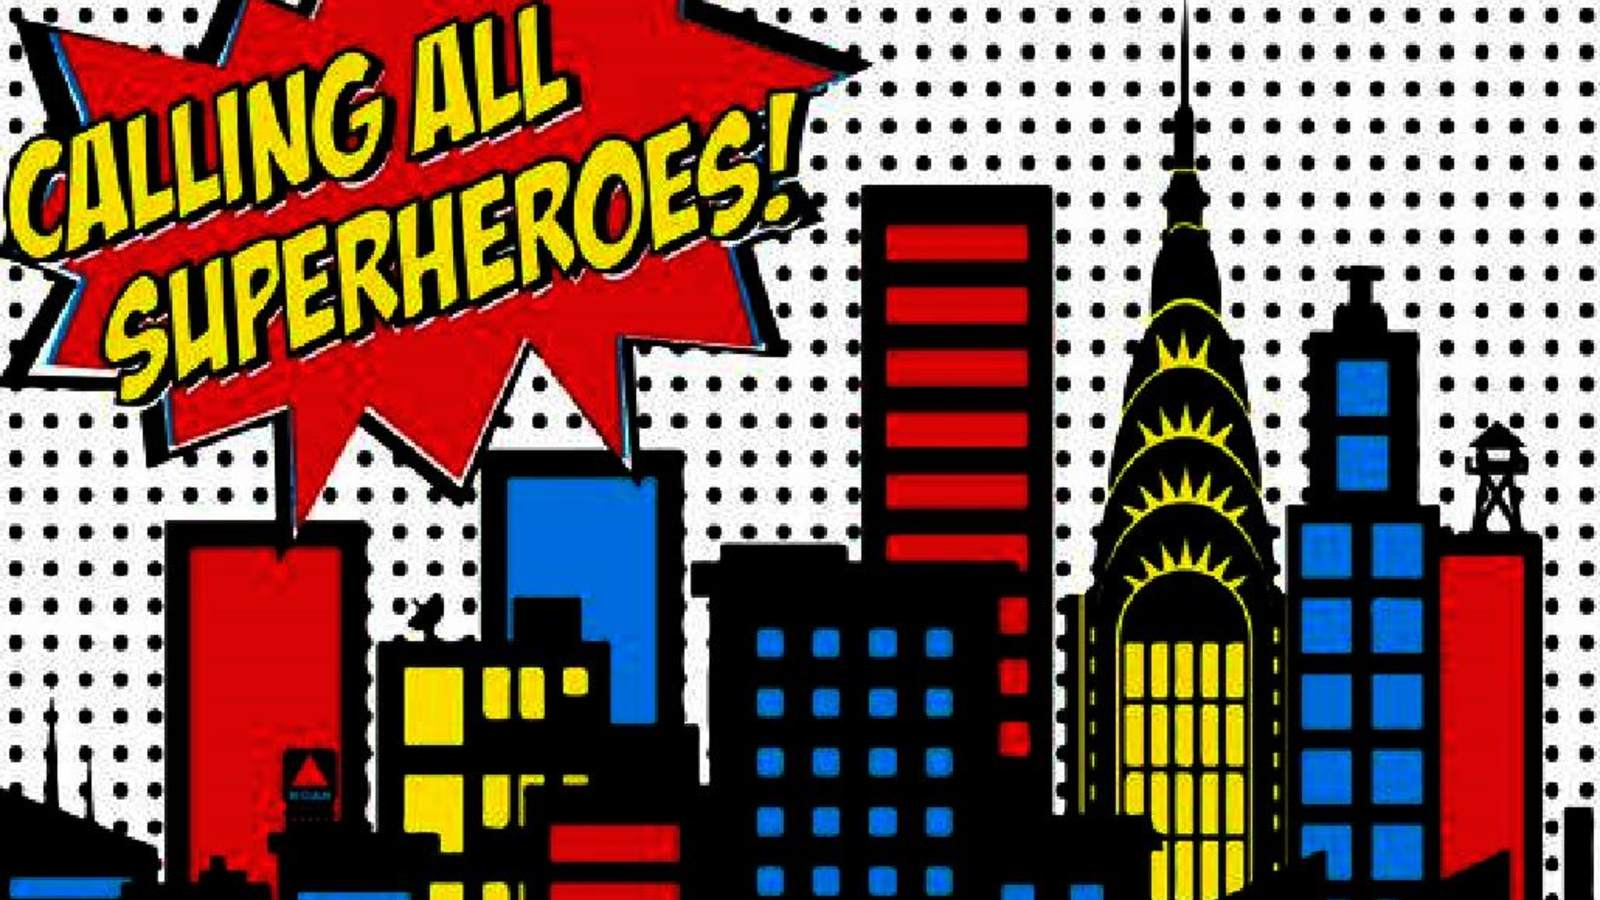 Calling all superheroes clipart transparent Month of the Military Child Superhero Appreciation Event • USO New ... transparent